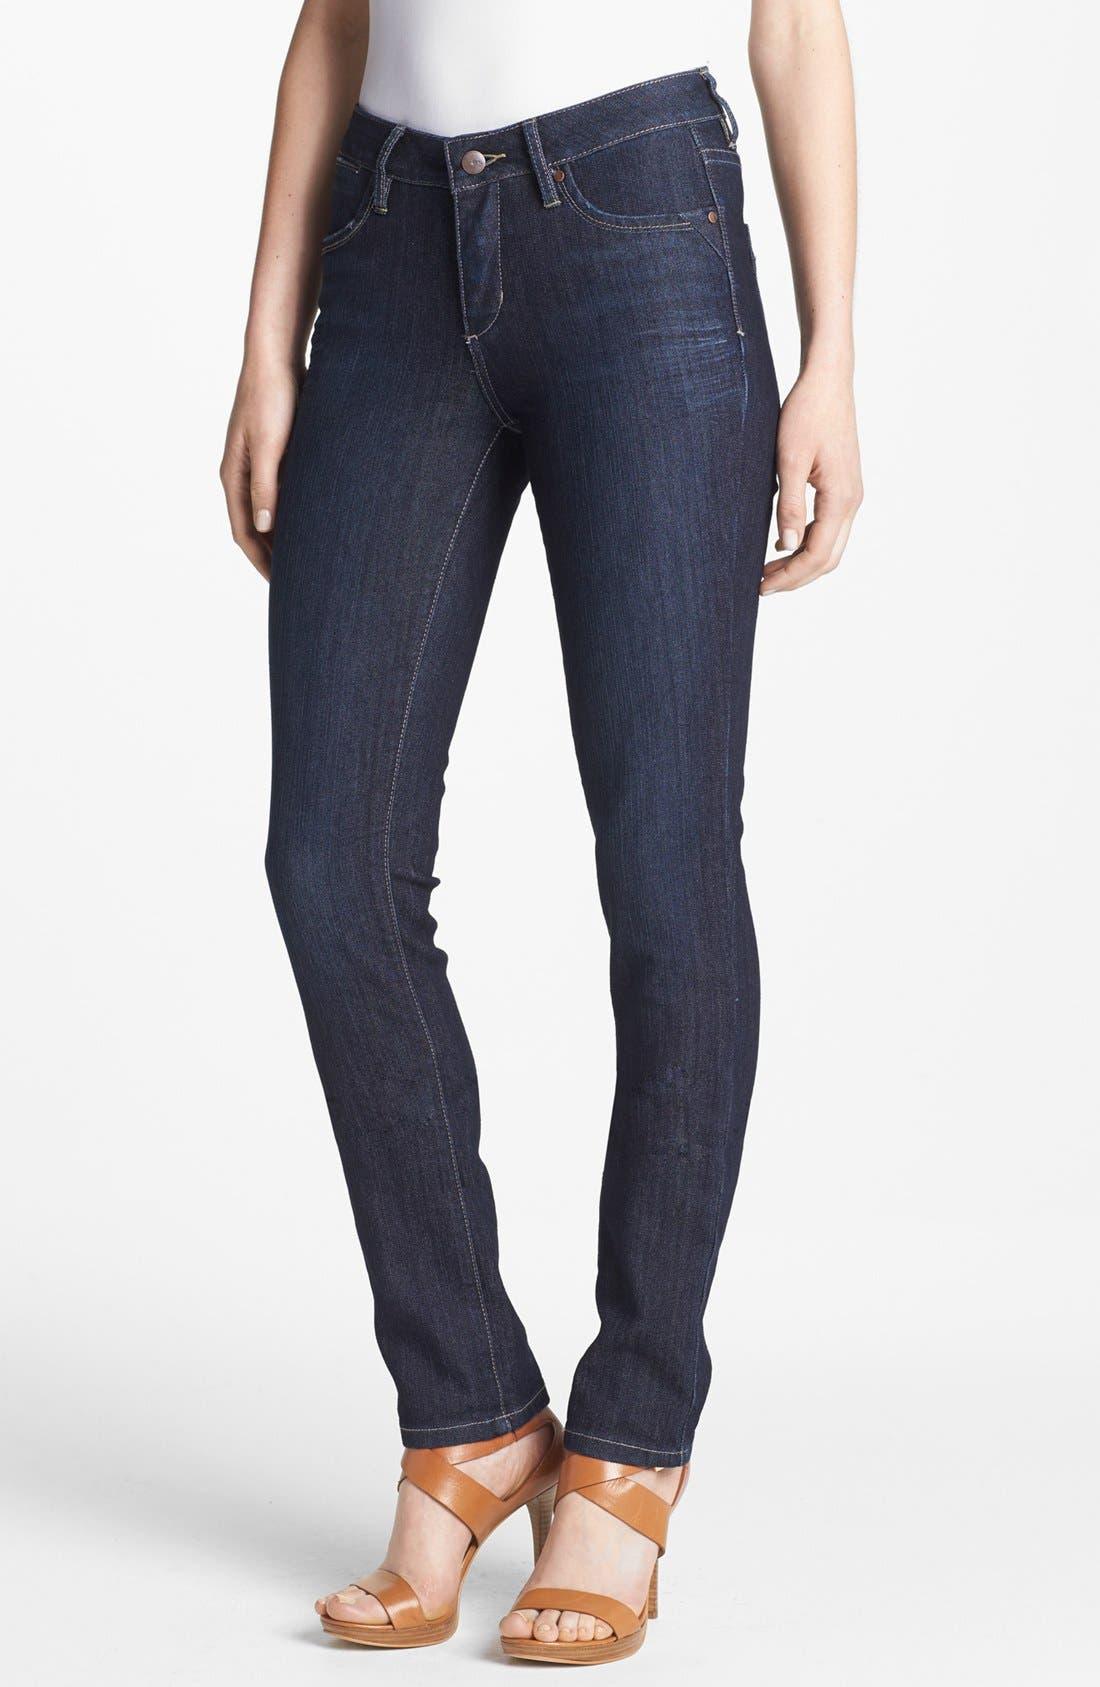 Alternate Image 1 Selected - Jag Jeans 'New Jane' Slim Stretch Jeans